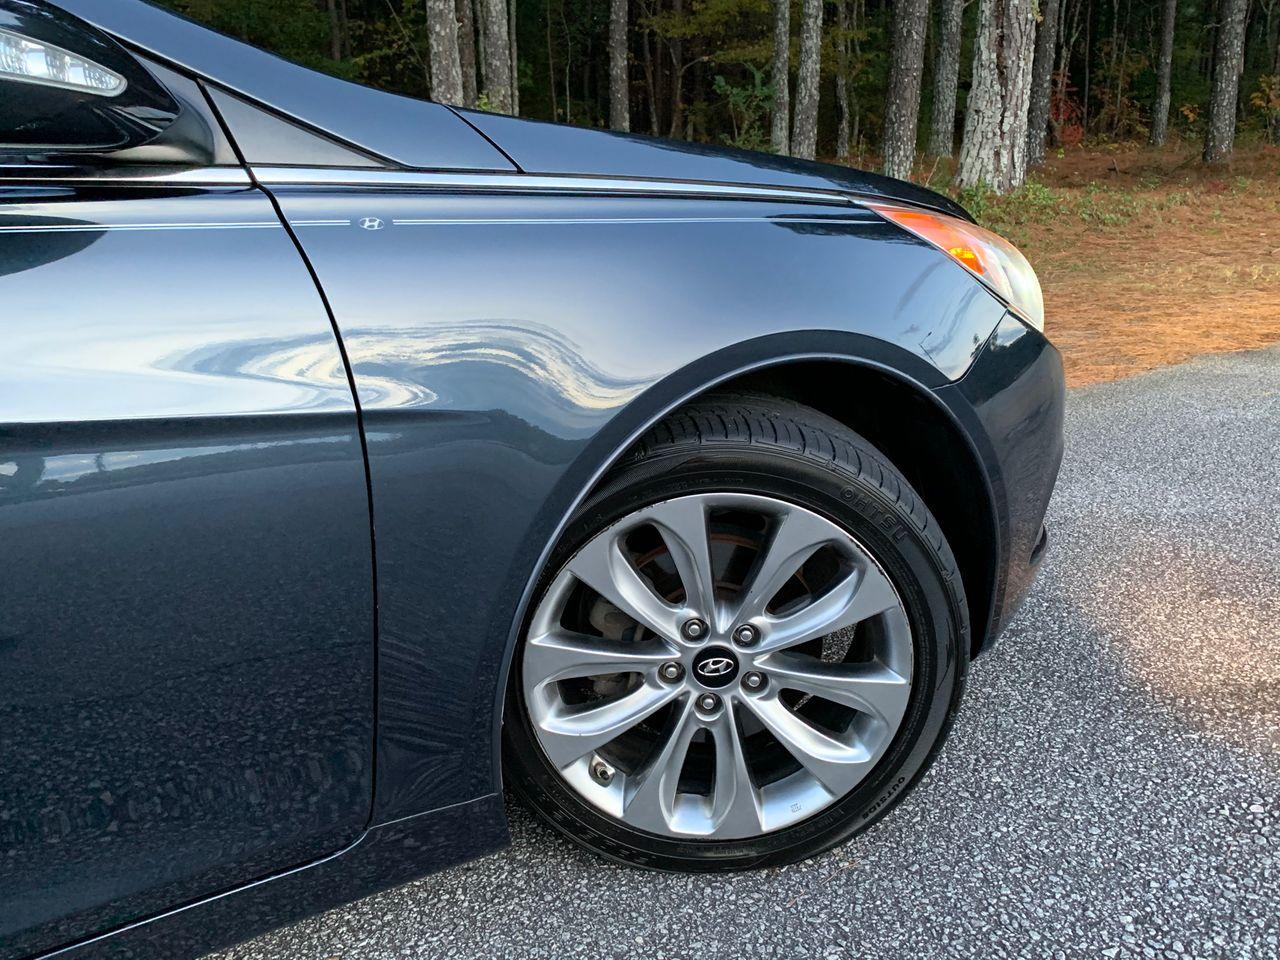 2012 Hyundai Sonata Limited 2.0T   Loganville, GA, Pacific Blue Pearl (Blue), Front Wheel